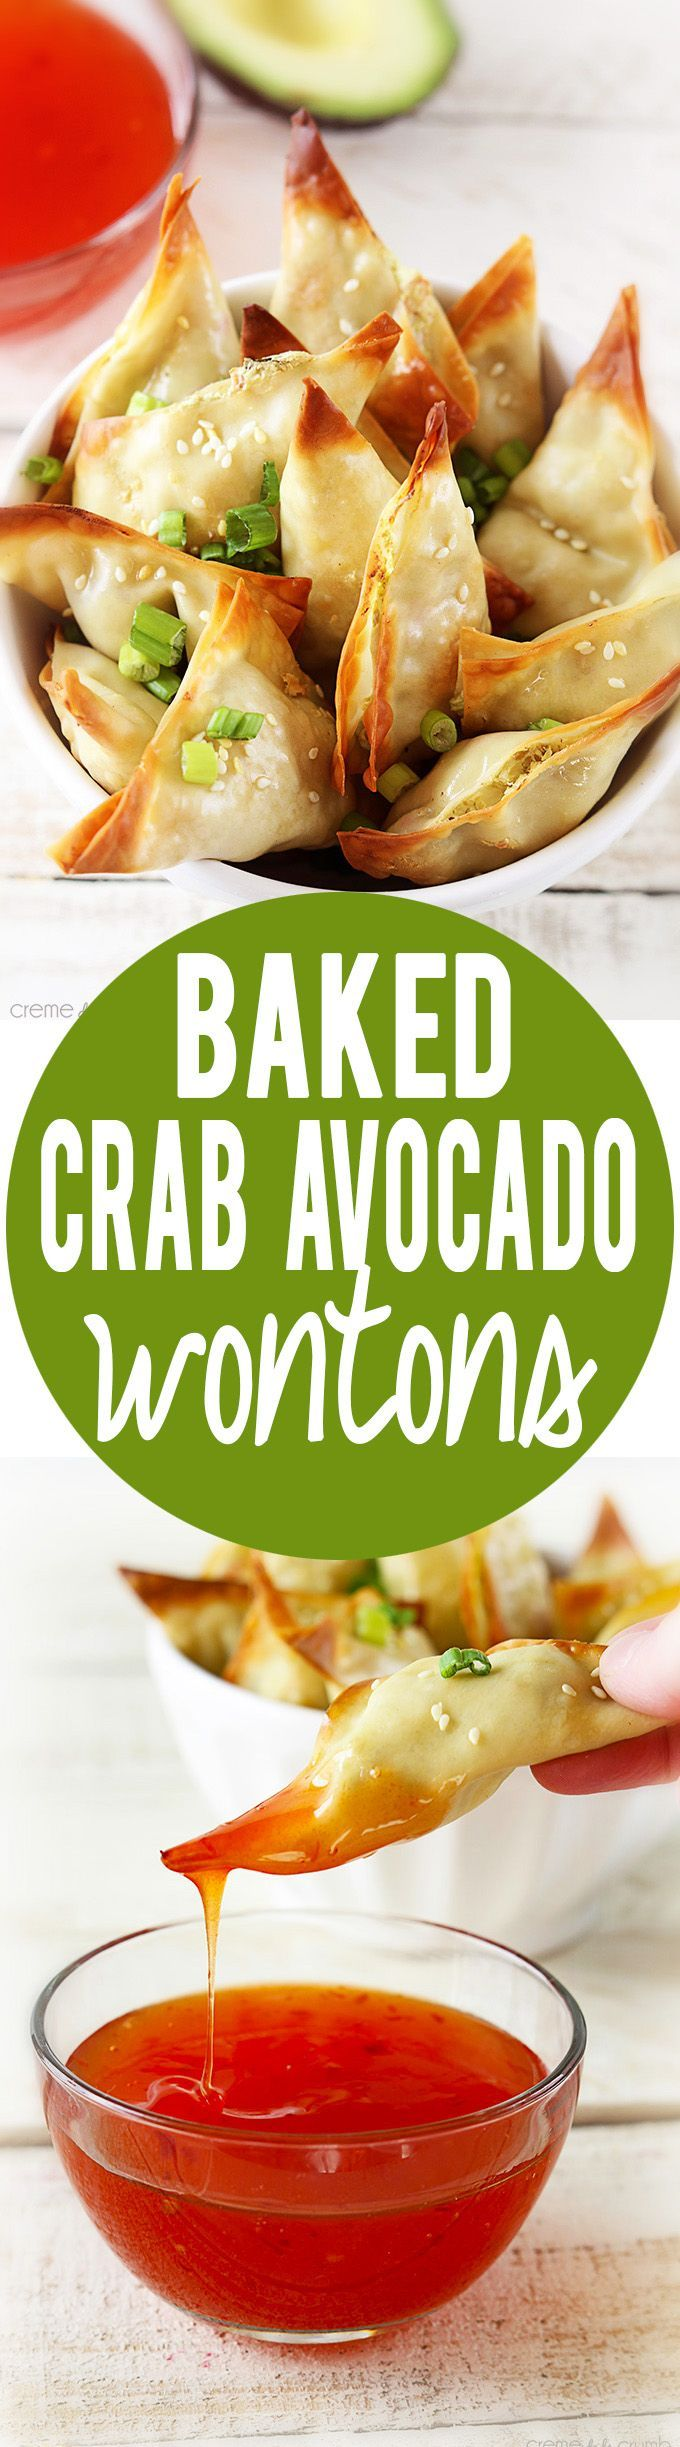 Oven Baked Crab Avocado Wontons | Creme de la Crumb